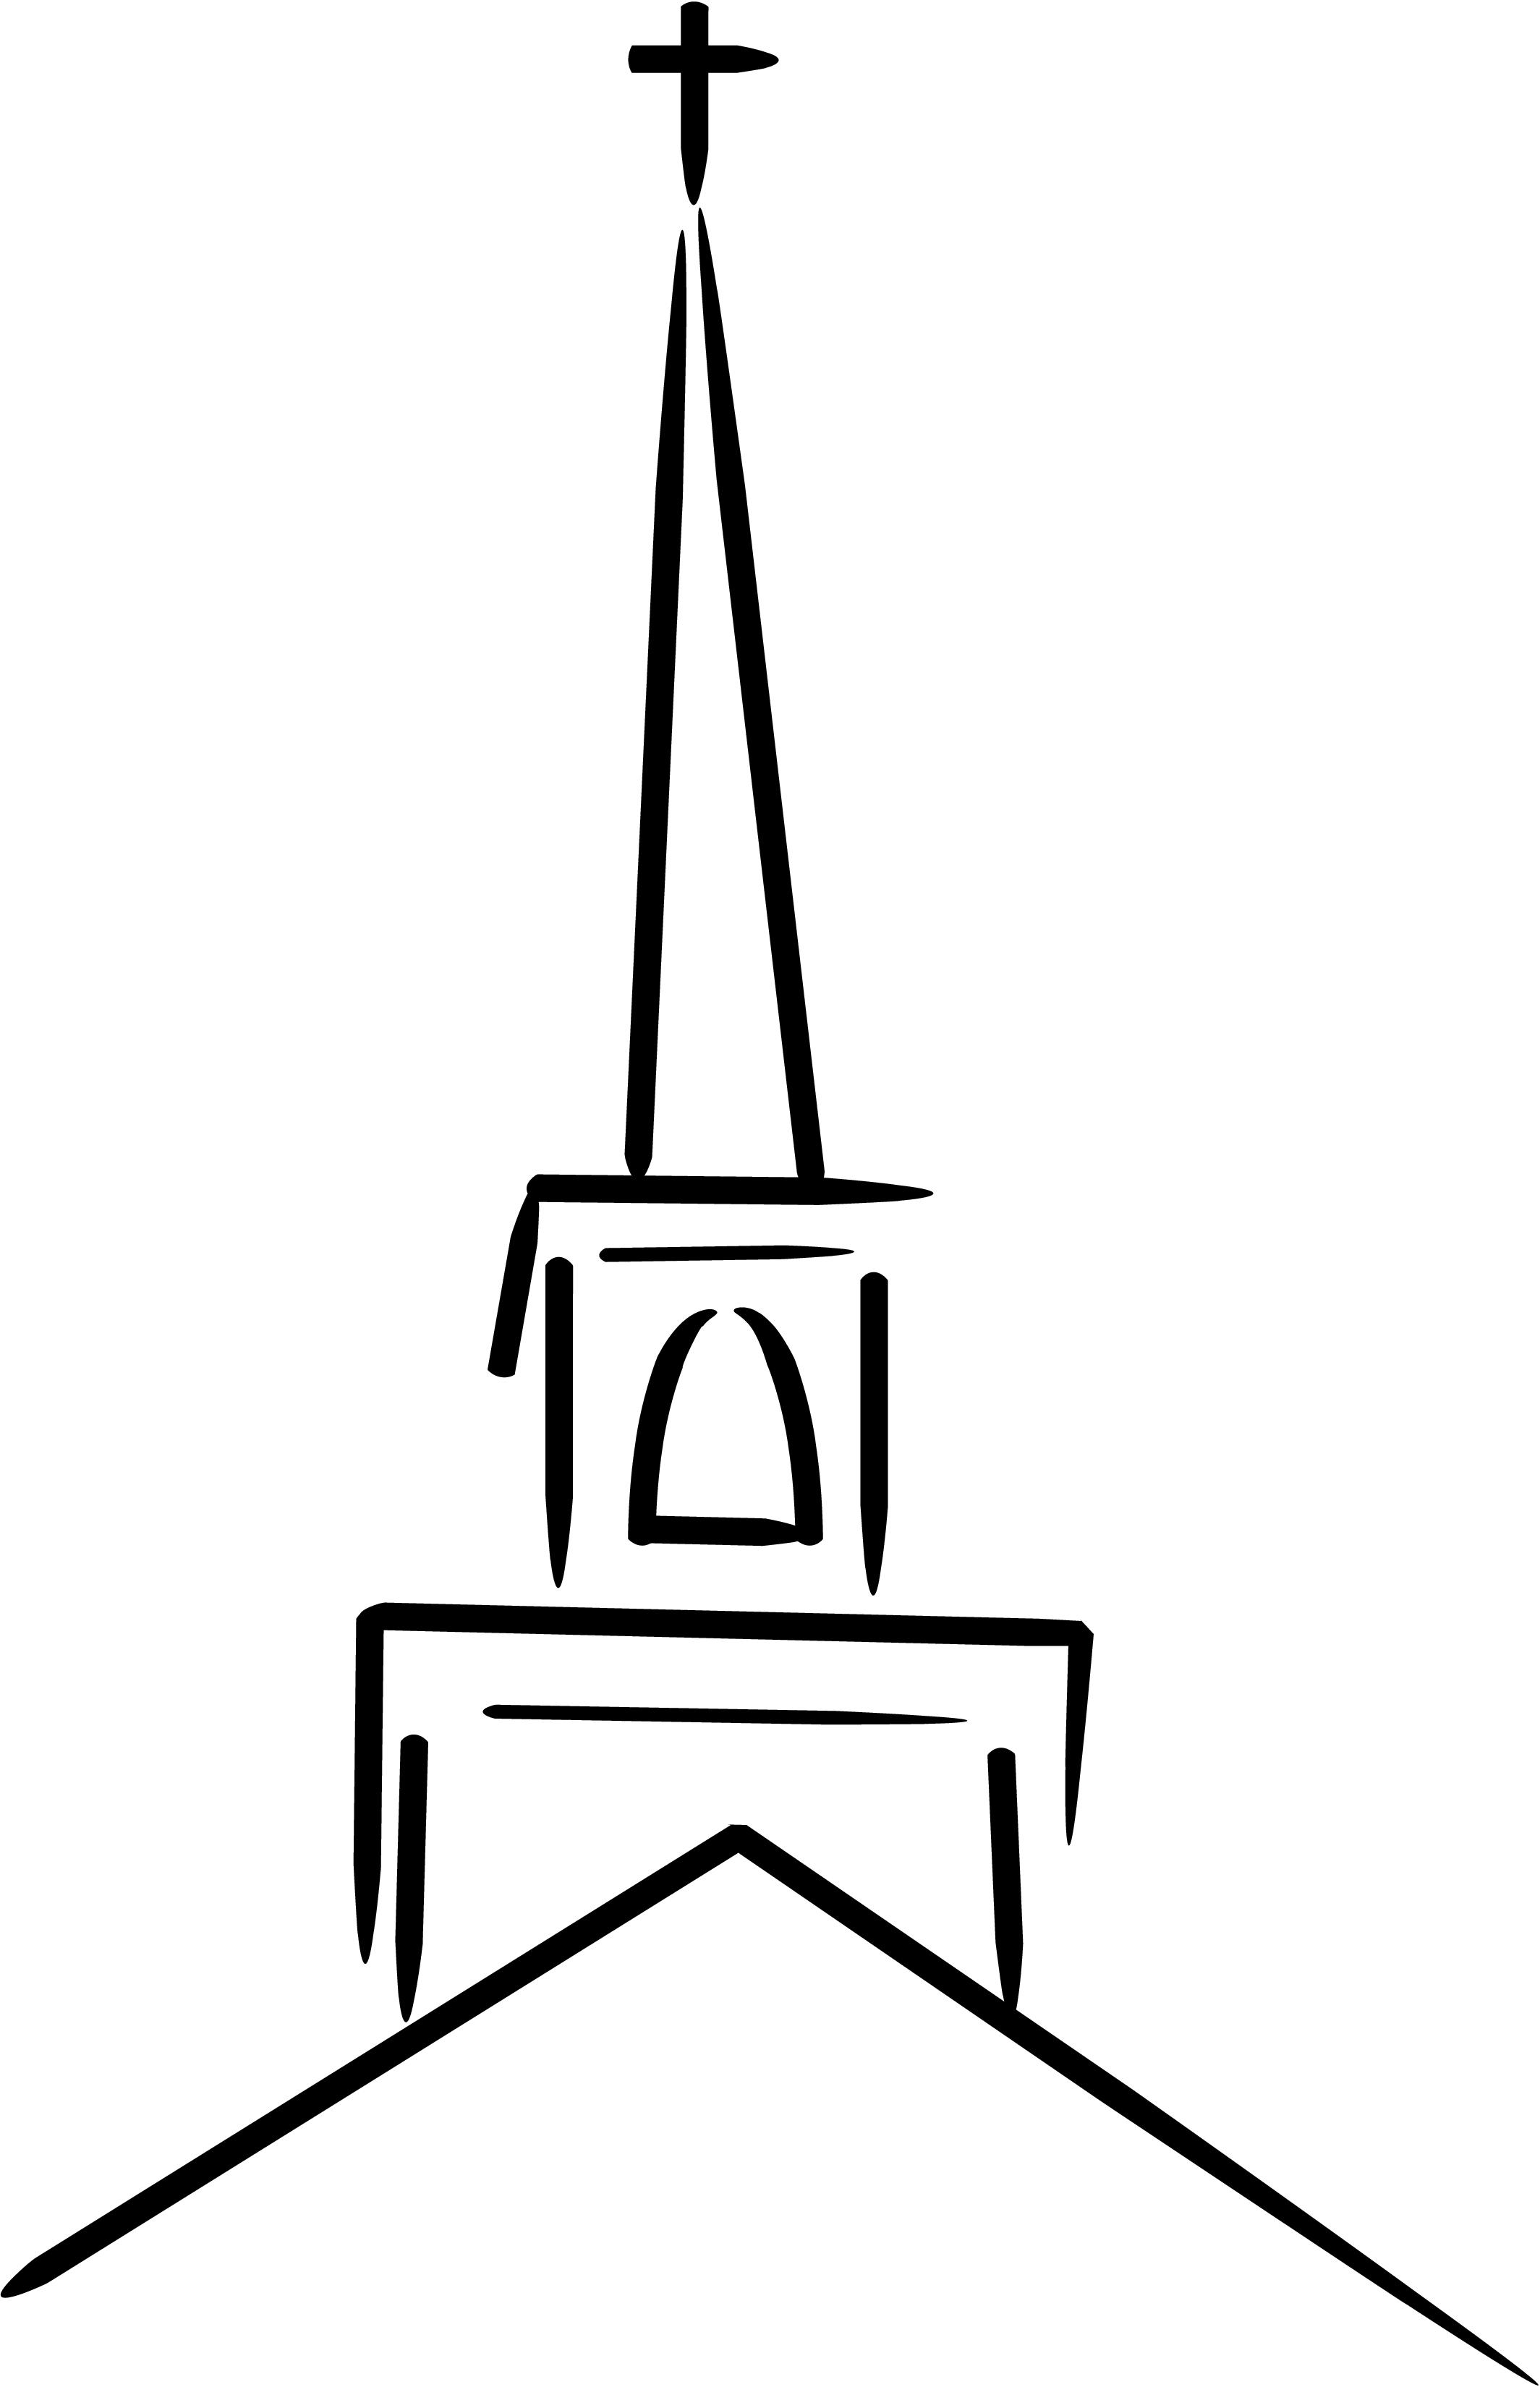 D Line Drawings Logo : Free cross sketch cliparts download clip art